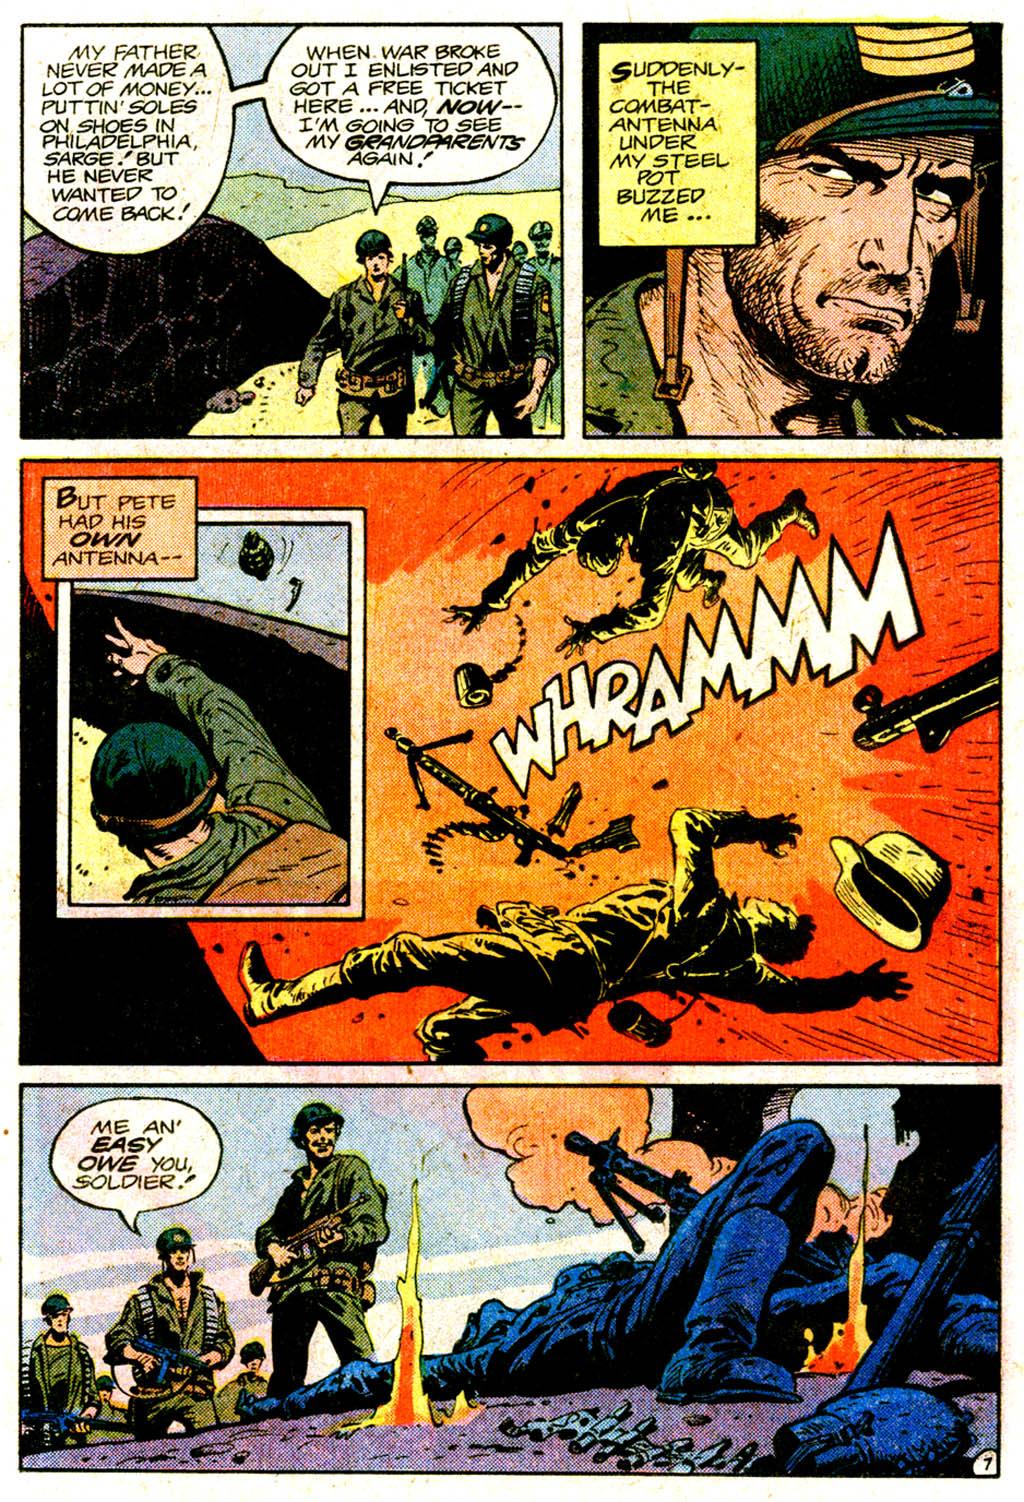 Read online Sgt. Rock comic -  Issue #364 - 10